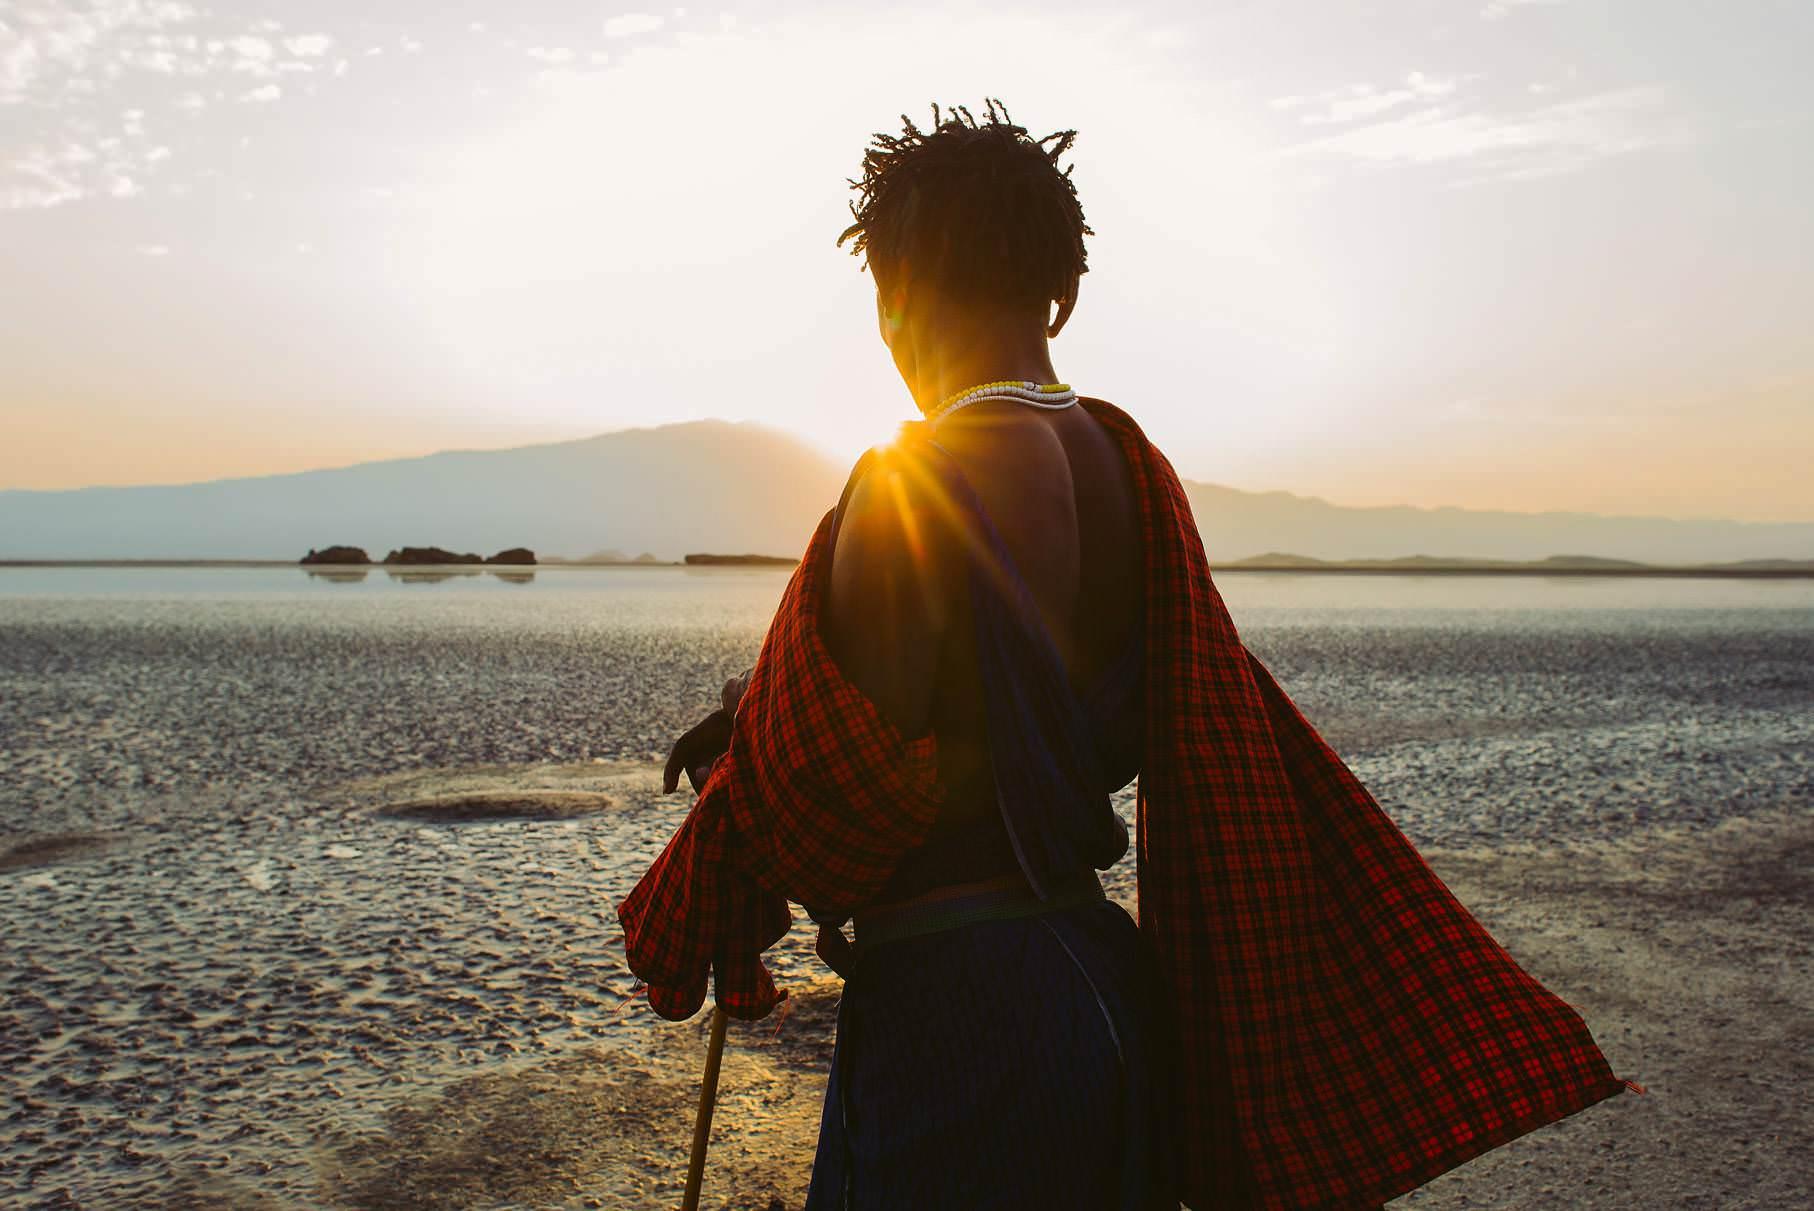 0025 tansania nd8 9821 anne bjoern fotografie hochzeitsfotograf hamburg - This is Tanzania - Serengeti, Kilimanjaro & Sansibar